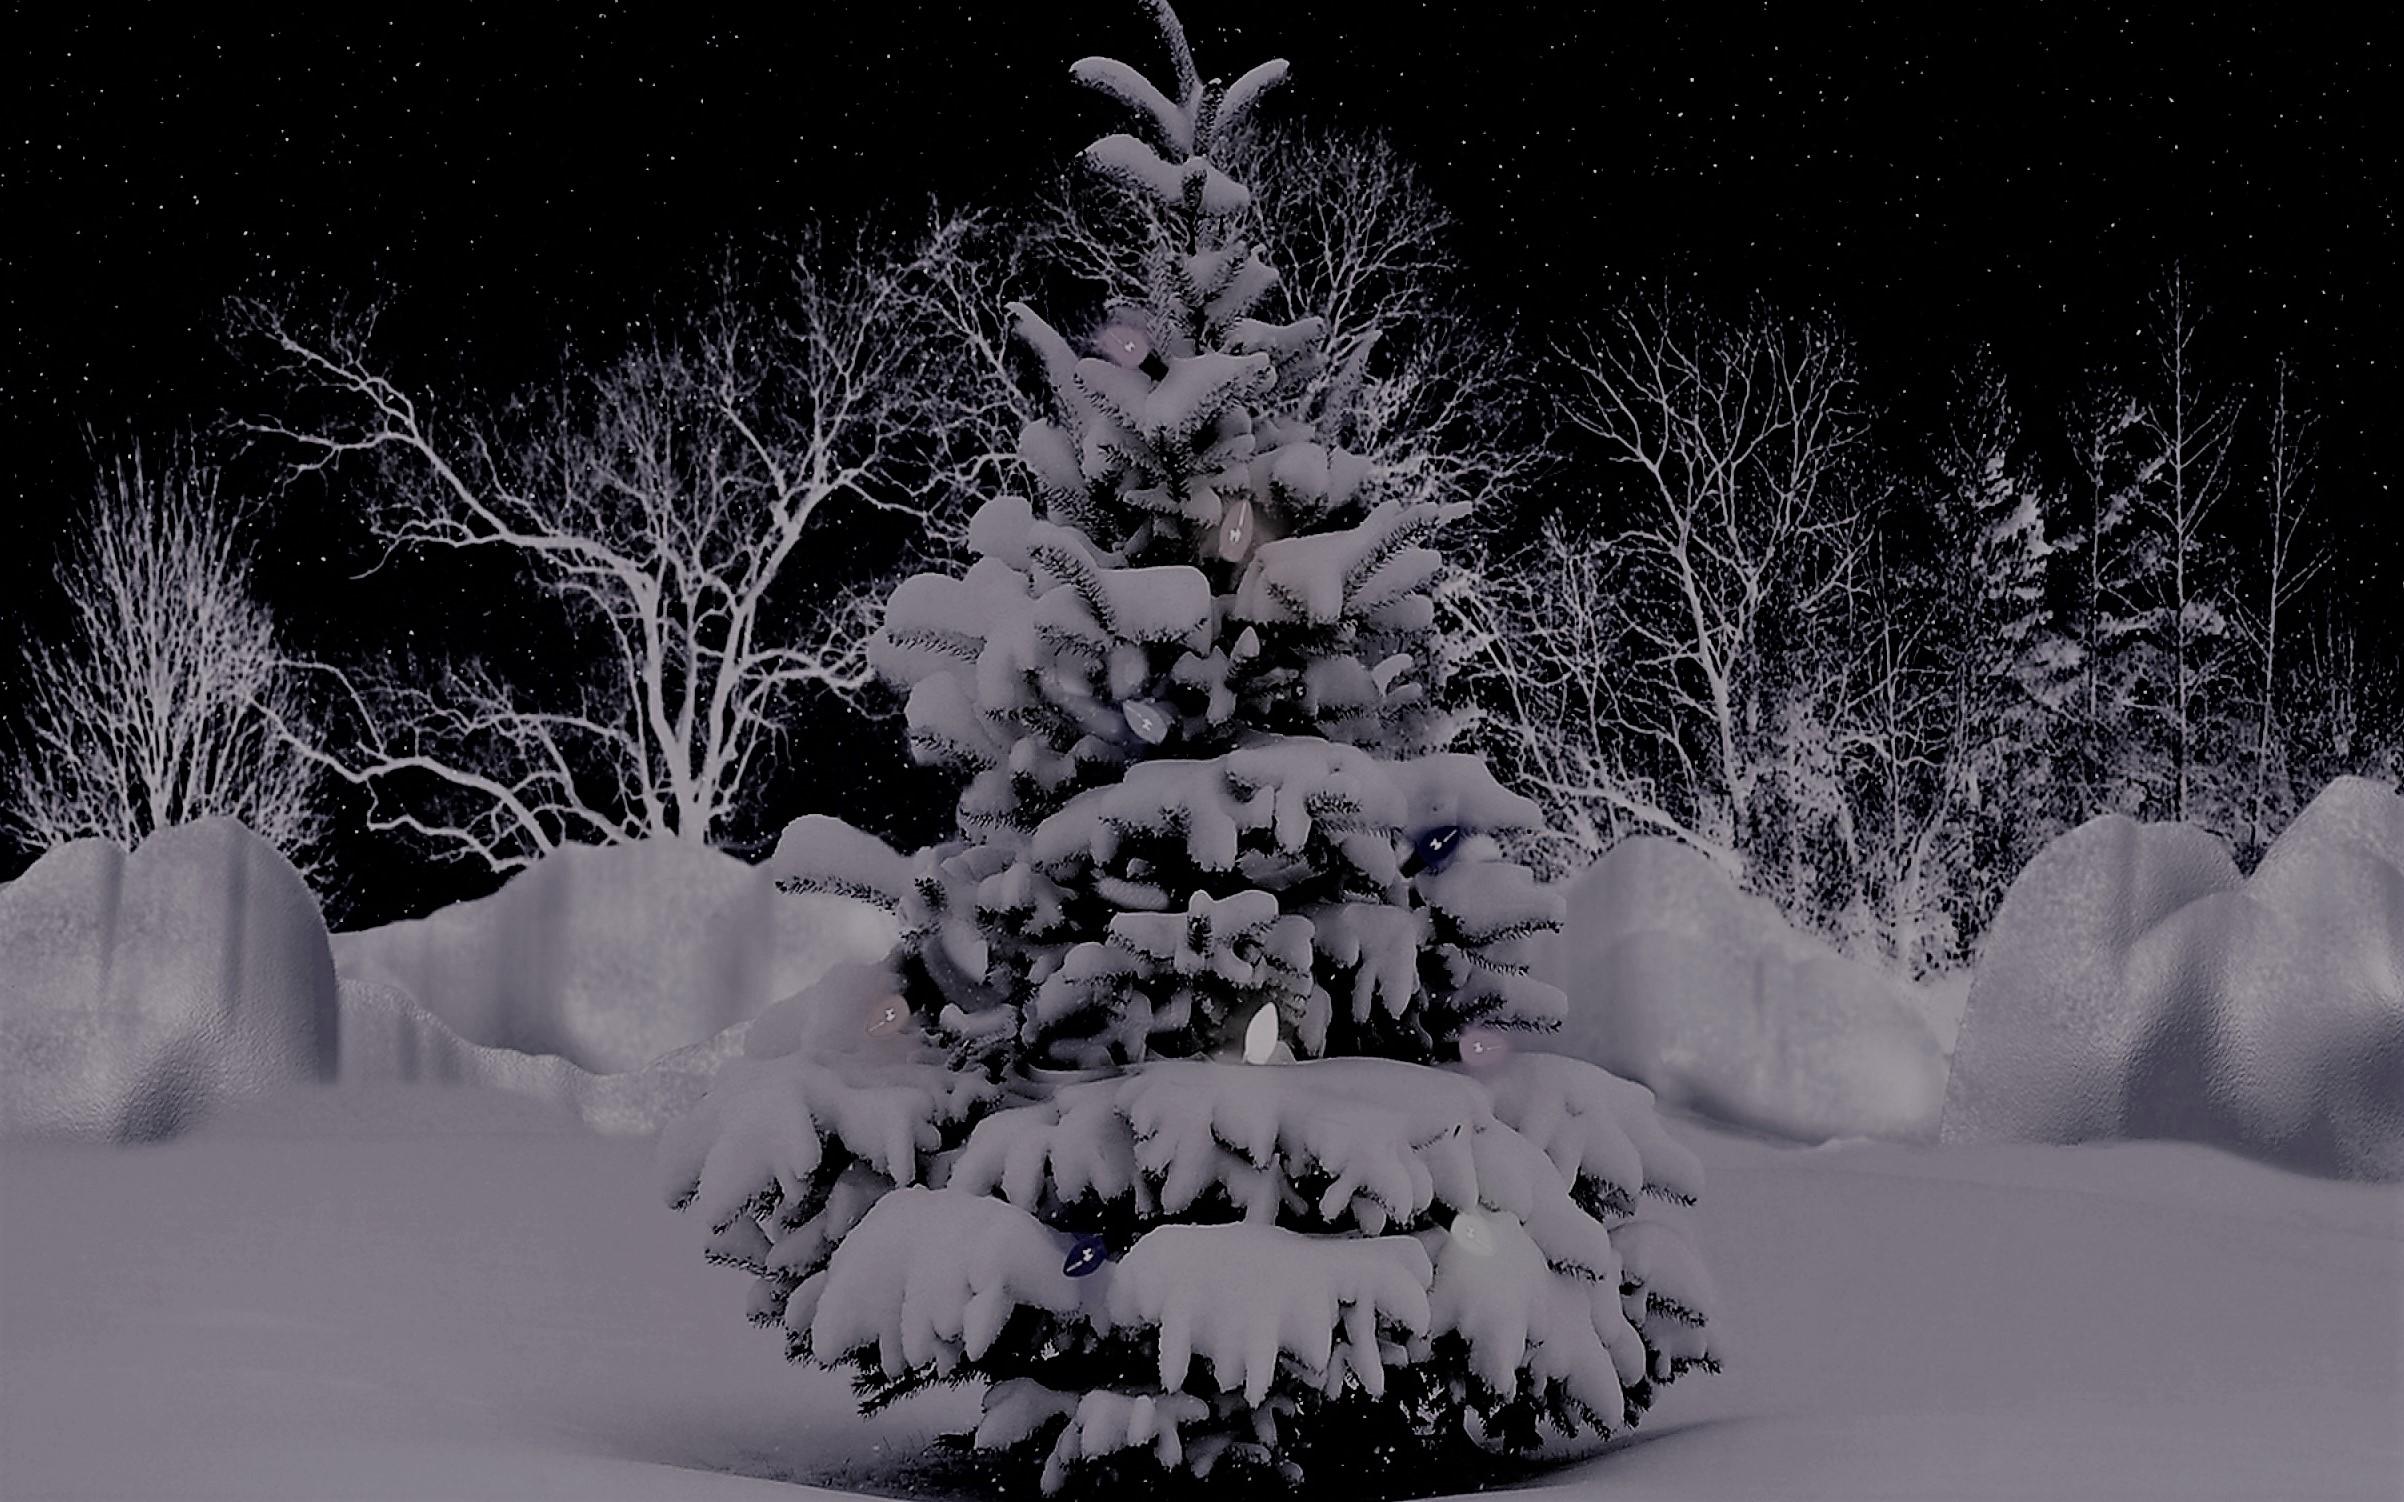 Silent Night, Christmas Song